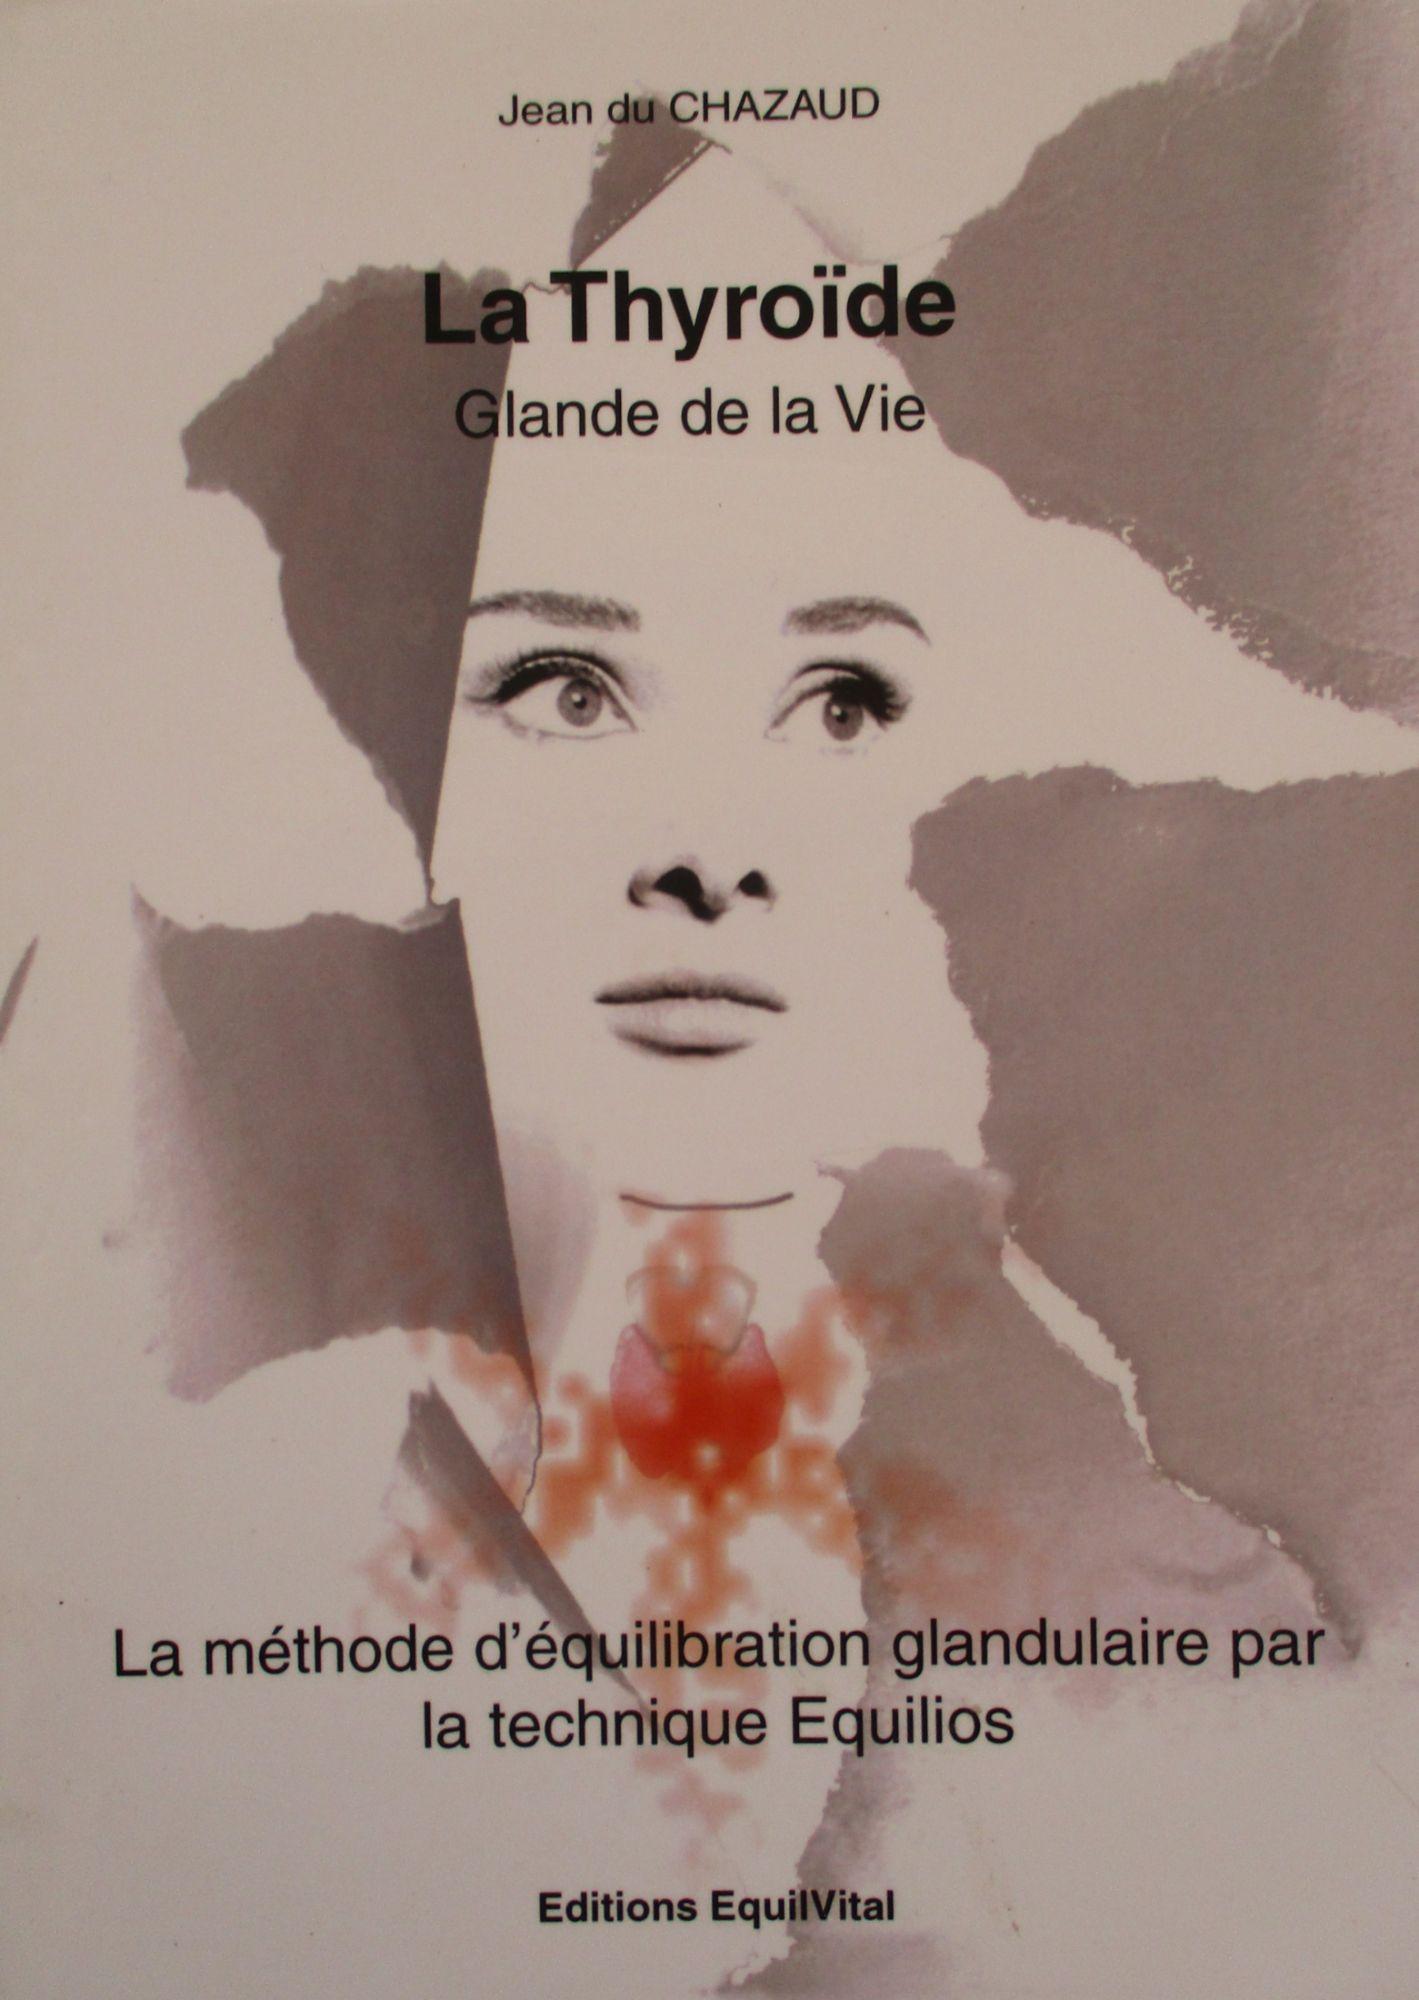 La Thyroide, Glande de la Vie